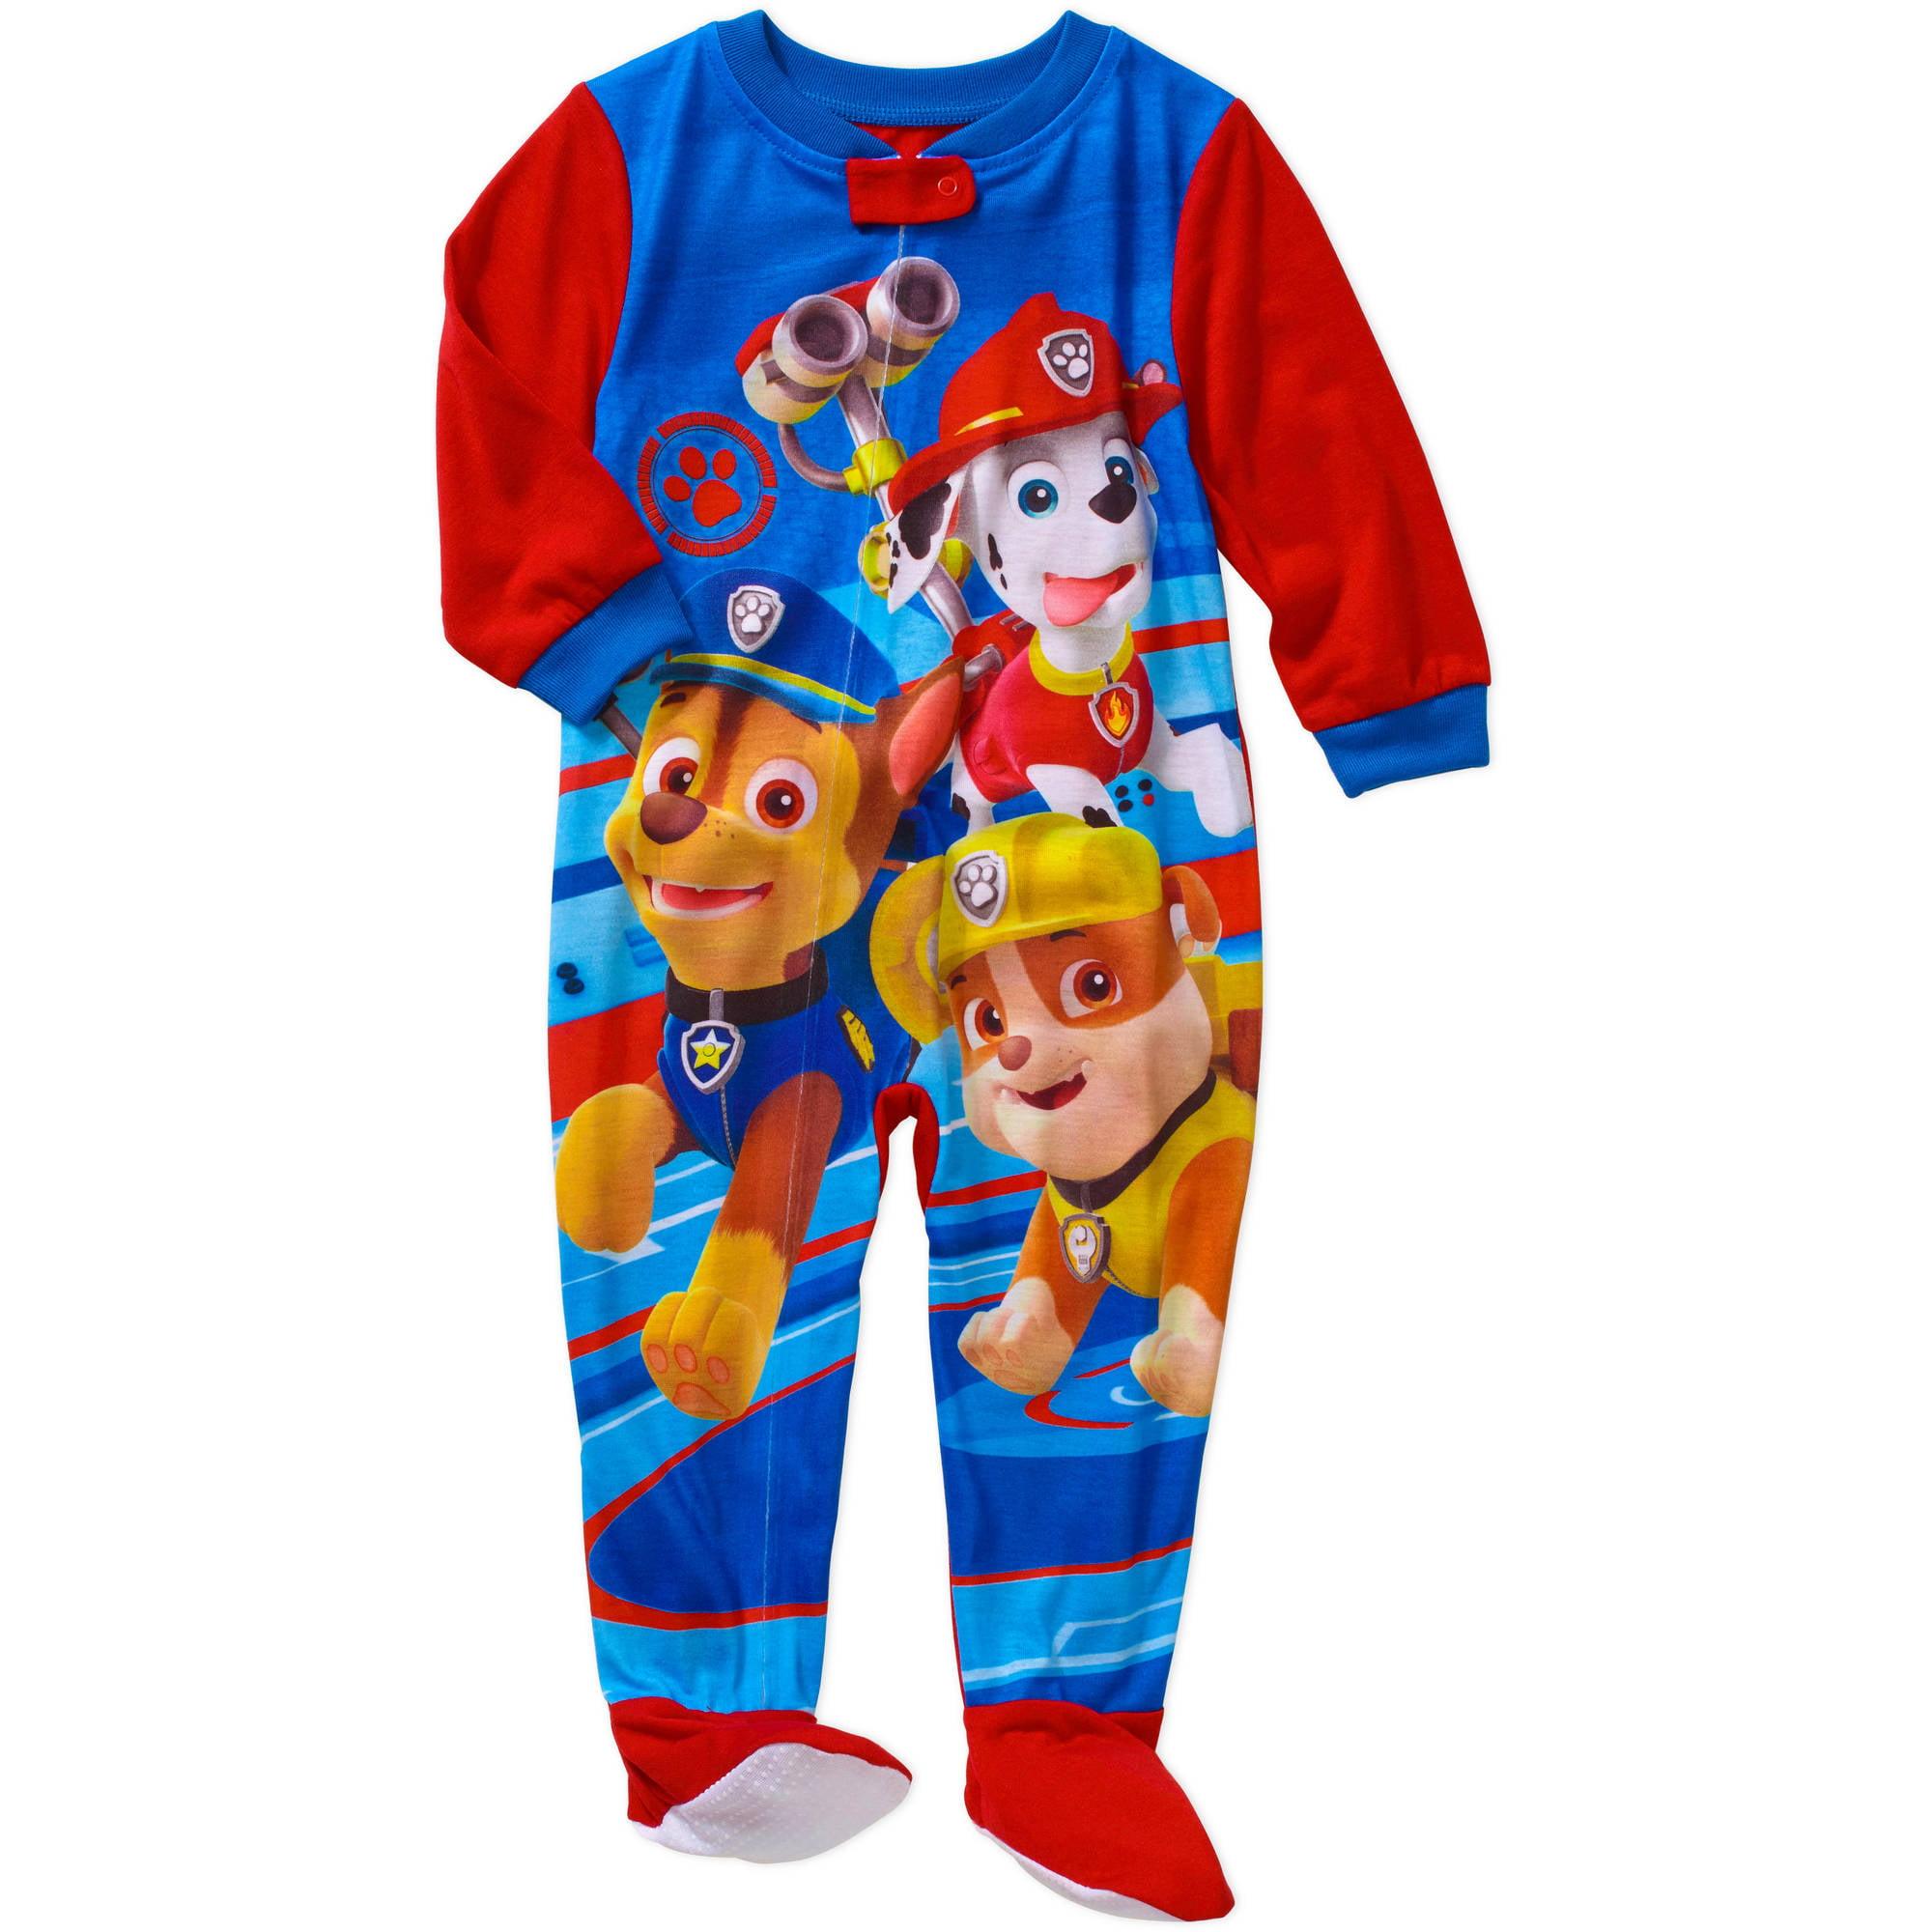 ac4892382 Batman Baby   Toddler Sleepwear